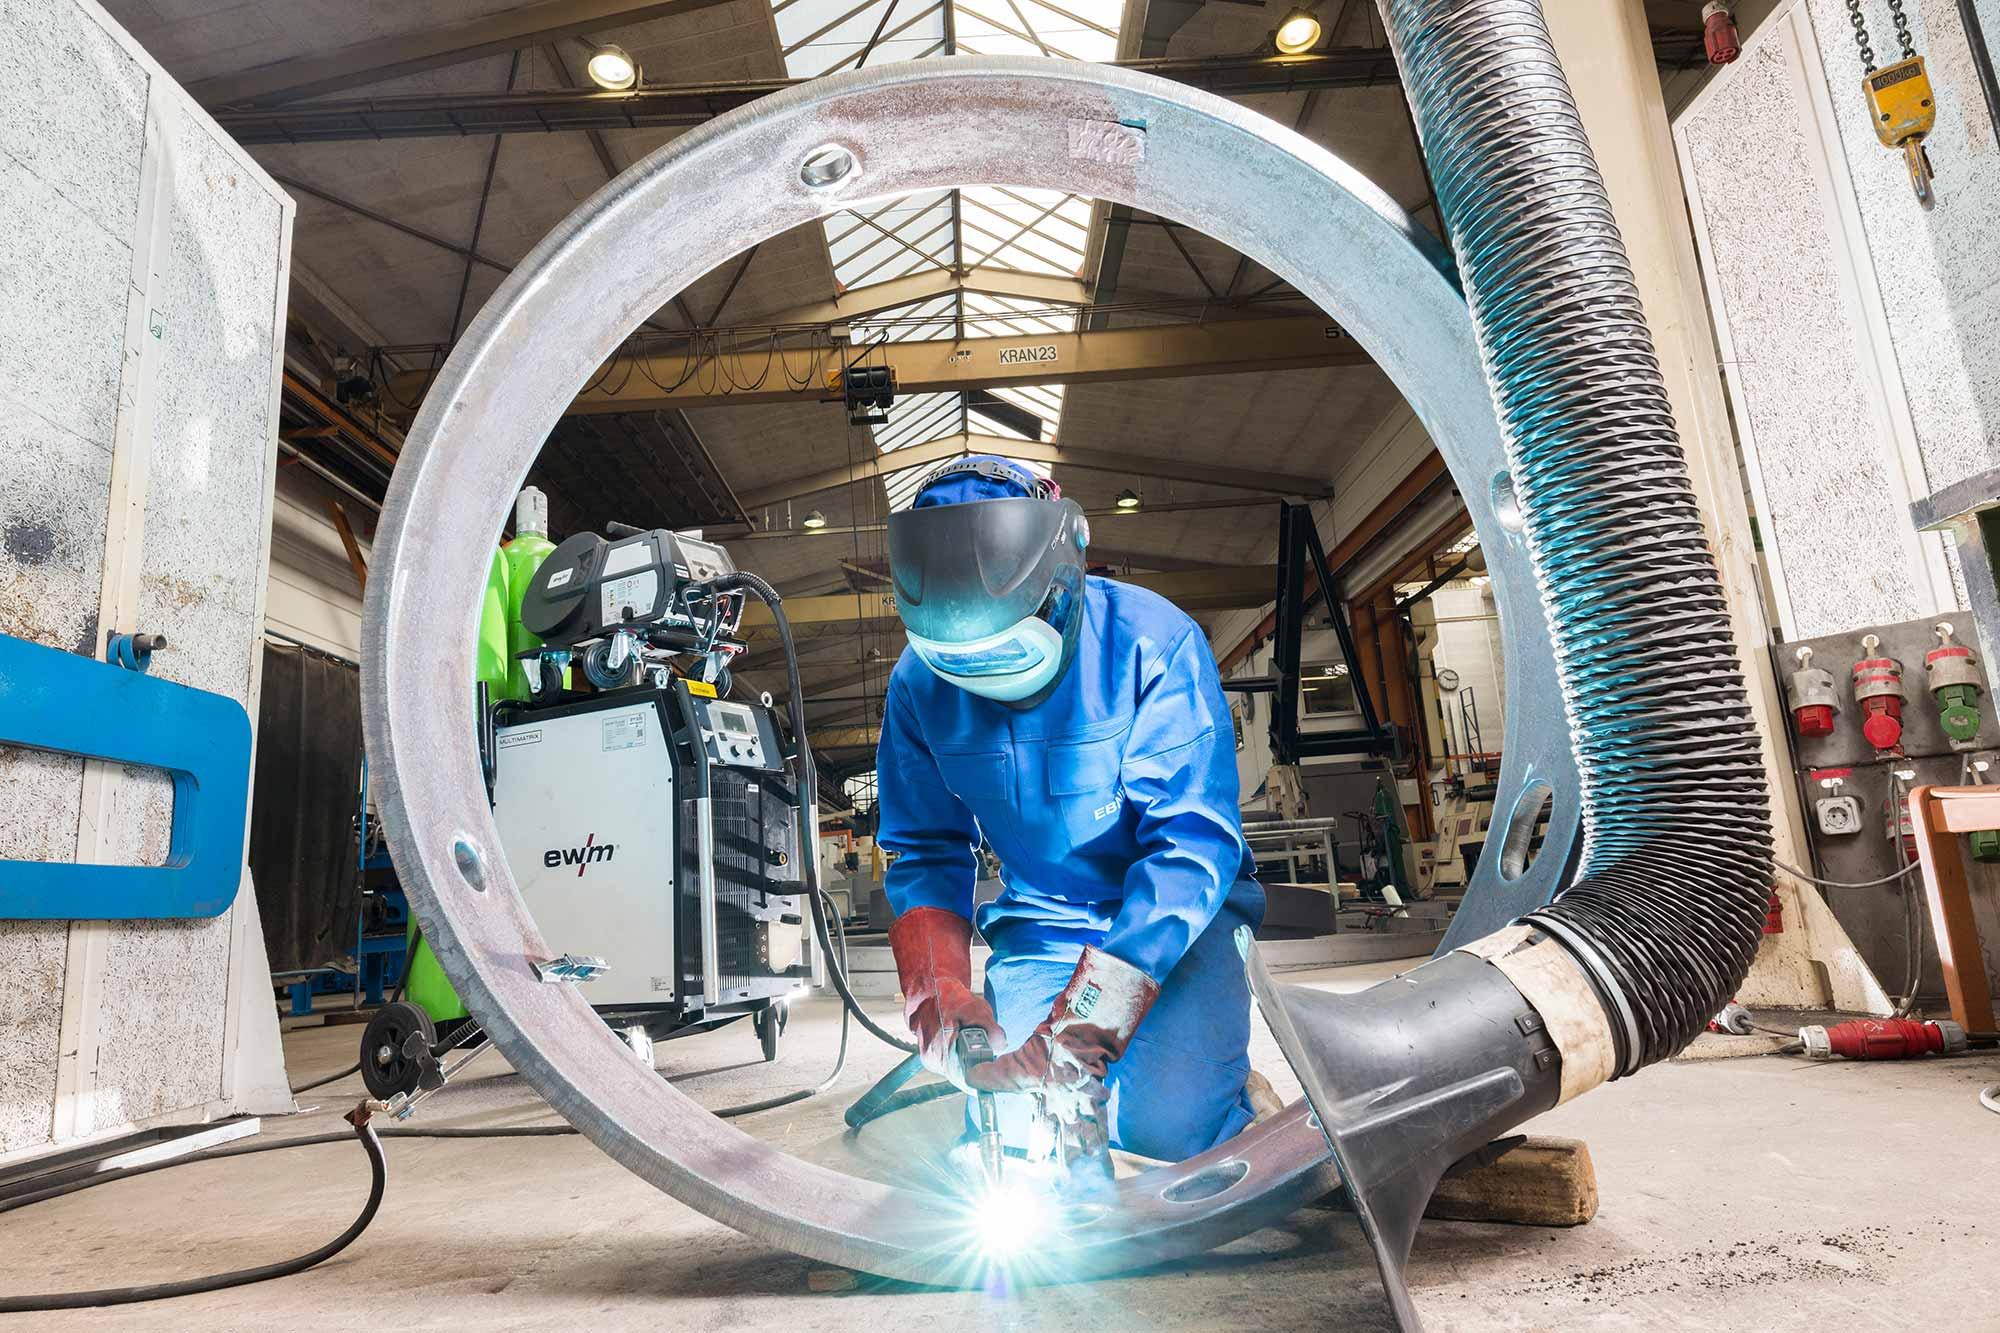 Ebner Industrieofenbau GmbH 2019